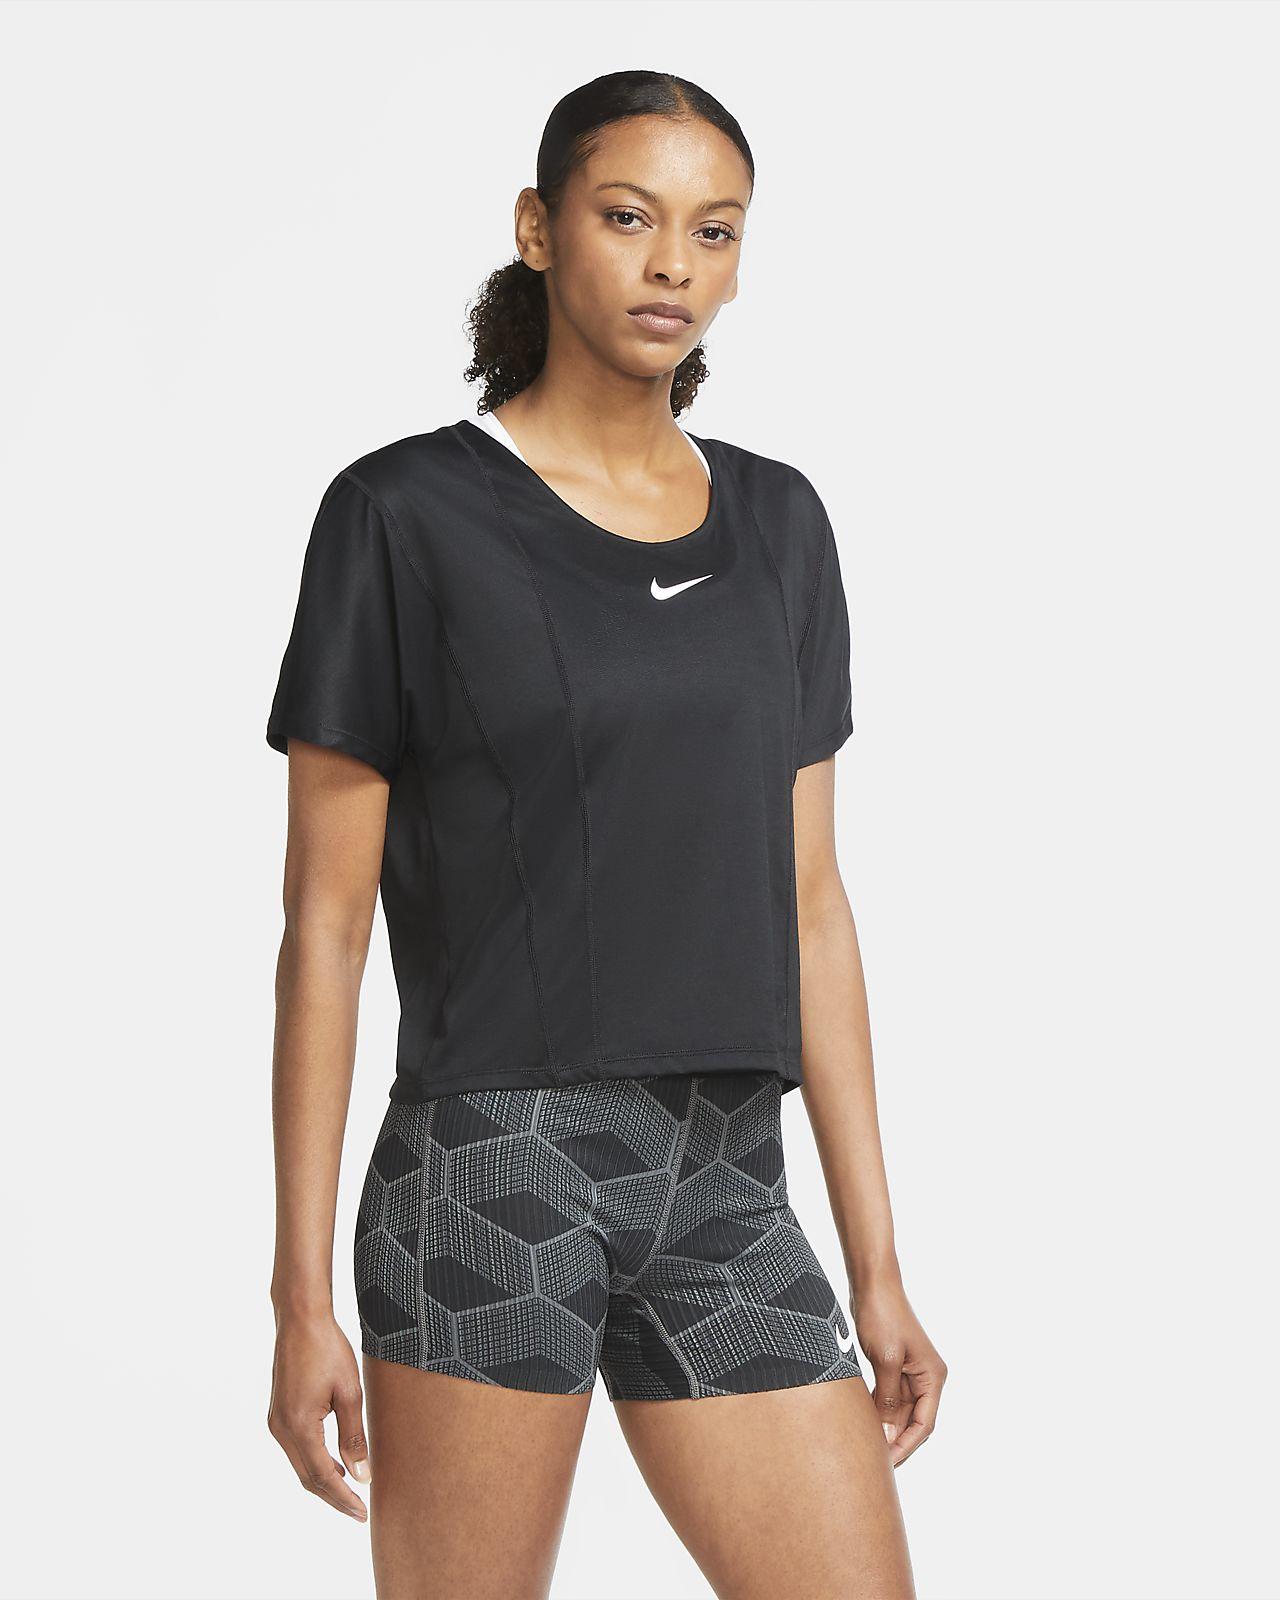 Nike Icon Clash City Sleek 女款跑步上衣